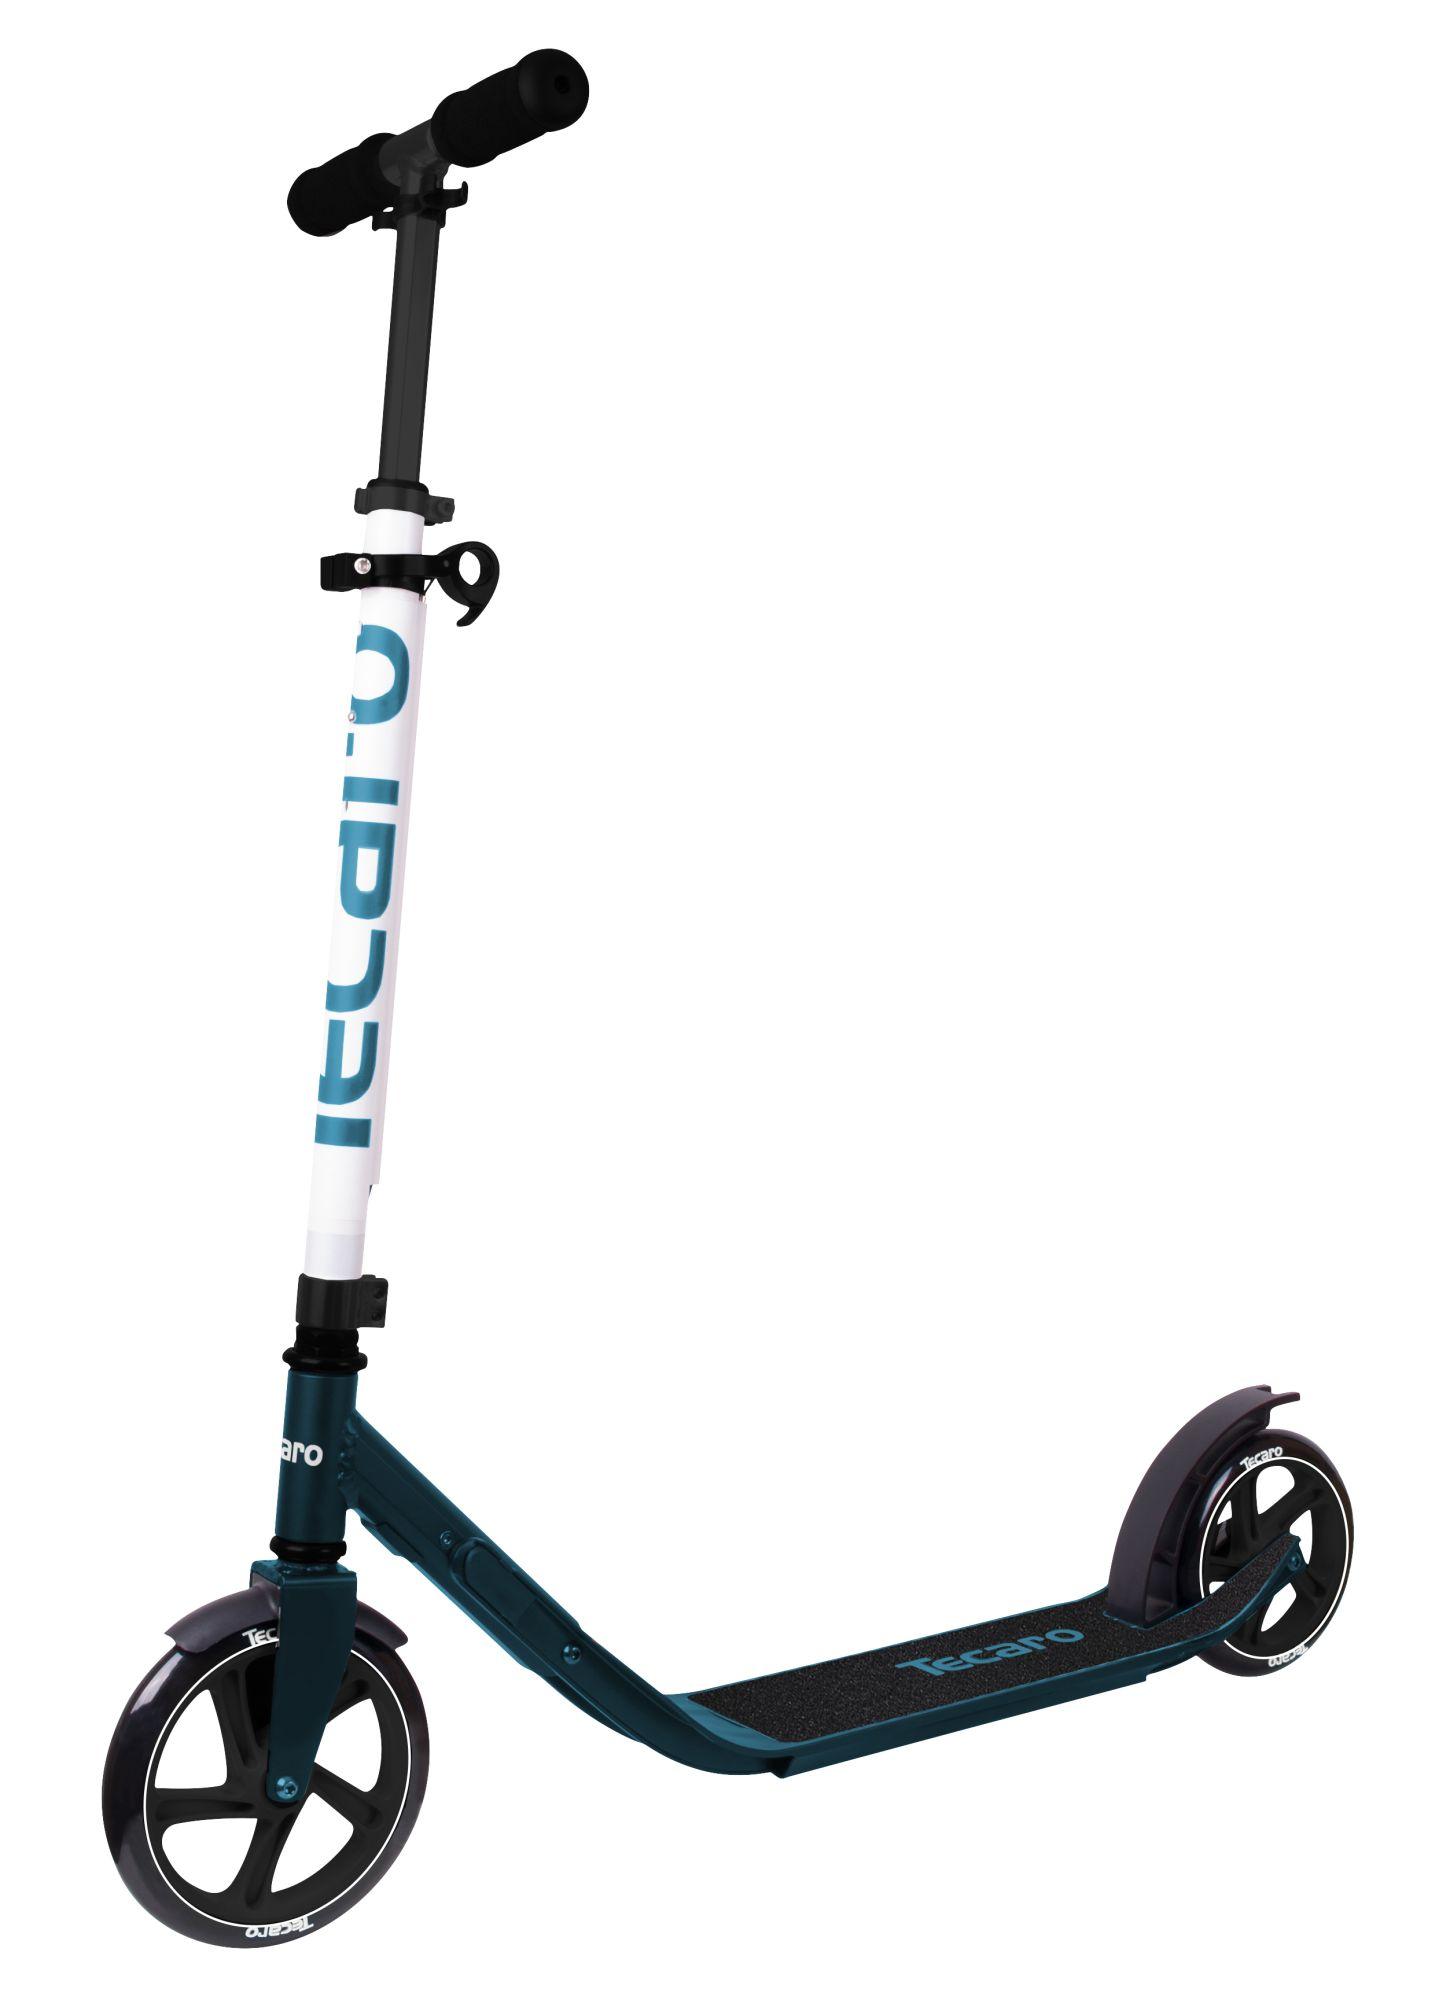 alu-skate-scooter/Kinderartikel: Tecaro  Alu Scooter  CLVR 205